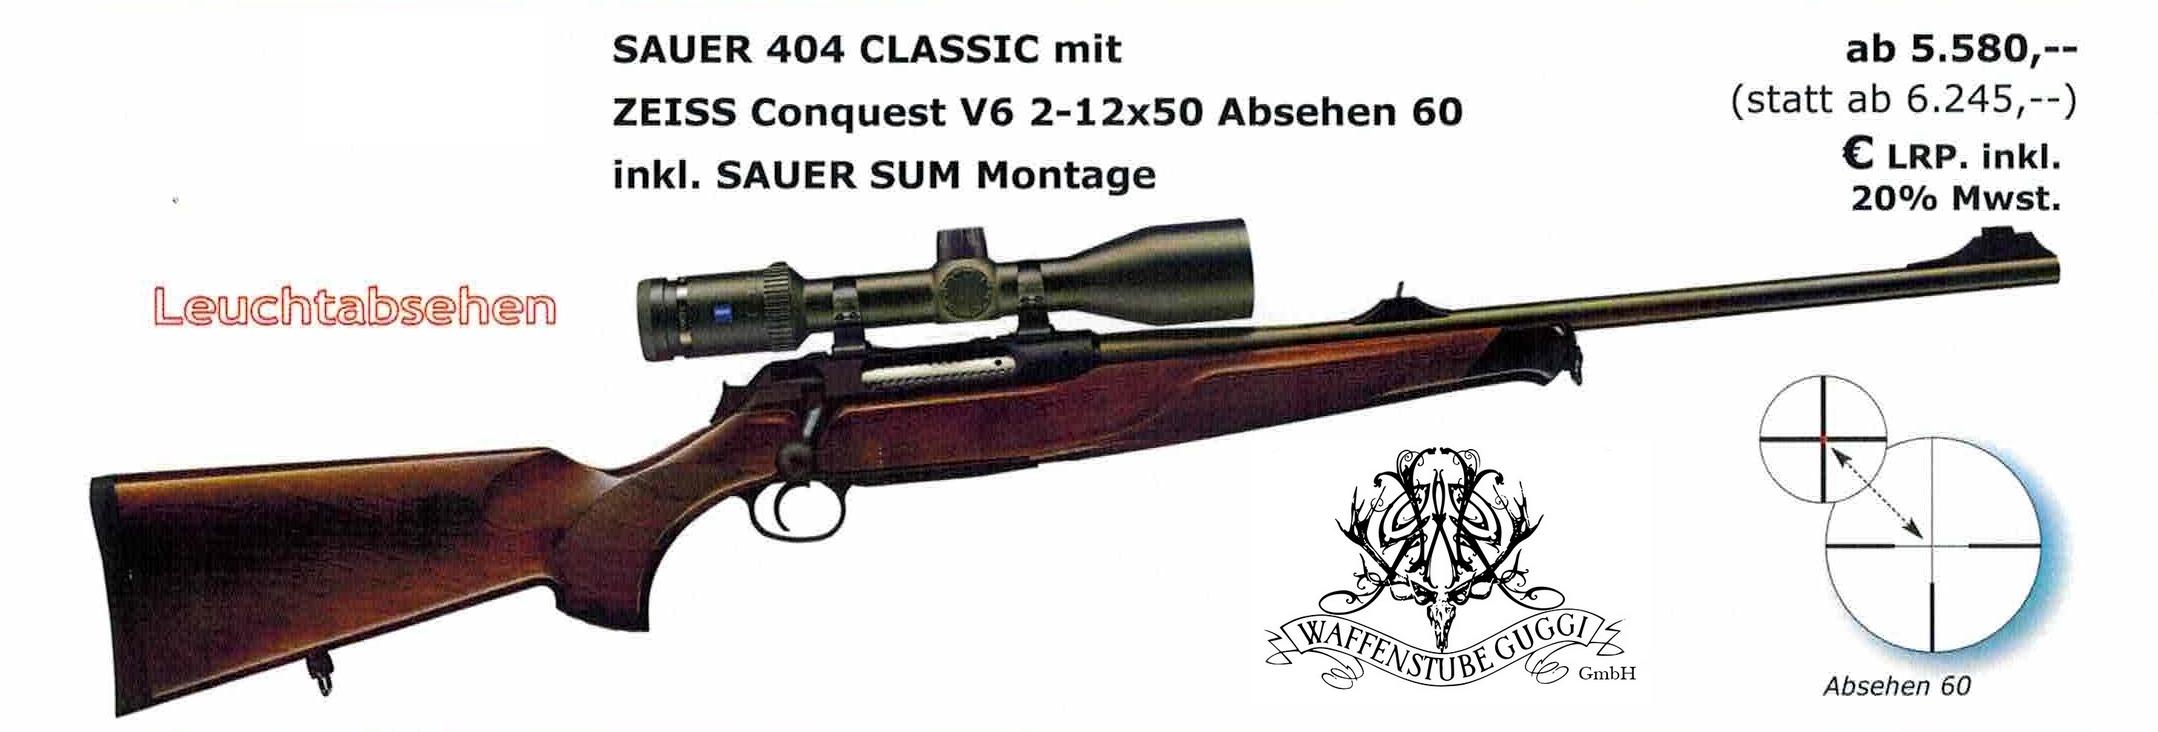 Sauer 404 Classic mit Zeiss Qonquest V6